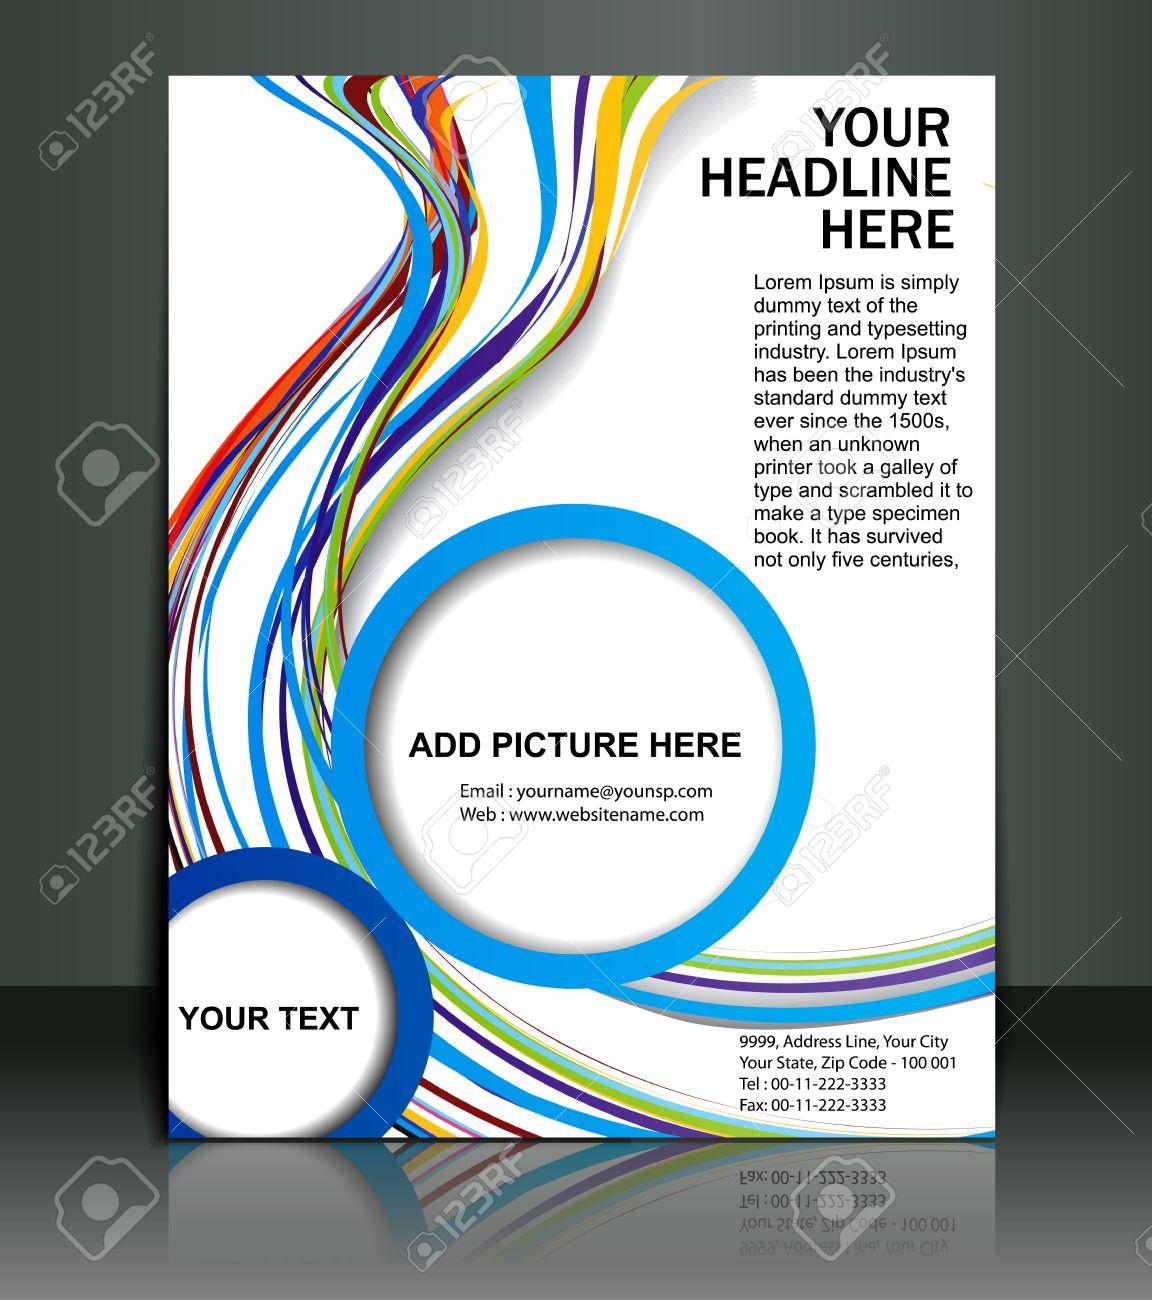 5s poster design - Download